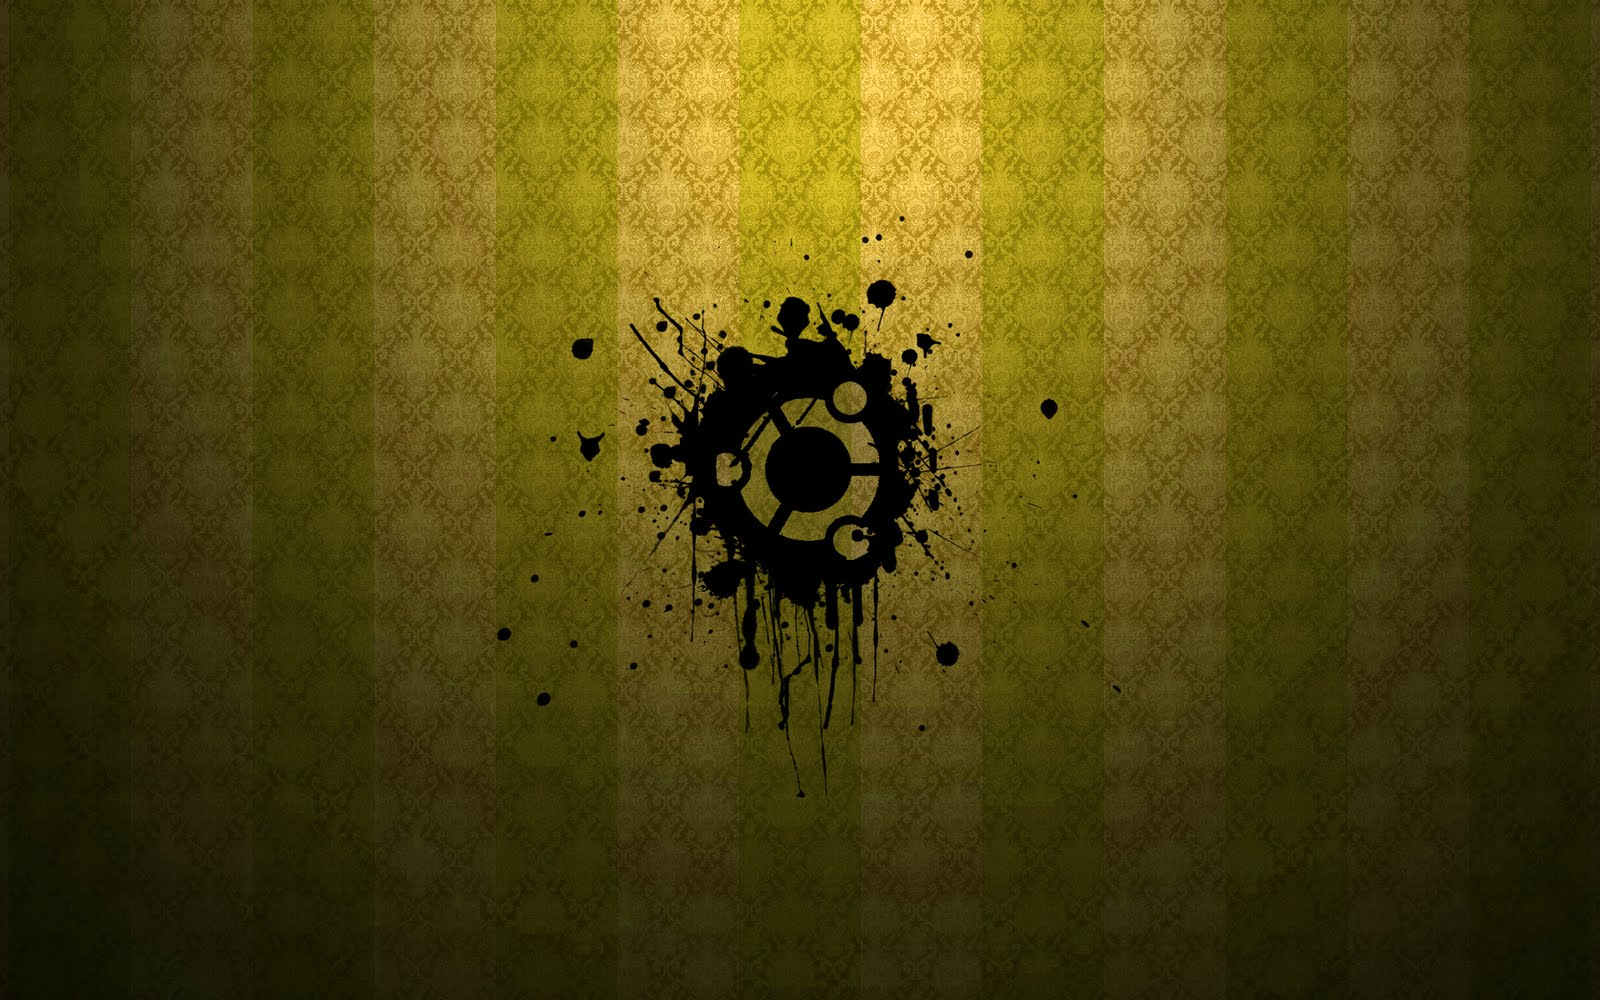 Wallpapers Box Linux Ubuntu HD Wallpapers Backgrounds 1600x1000